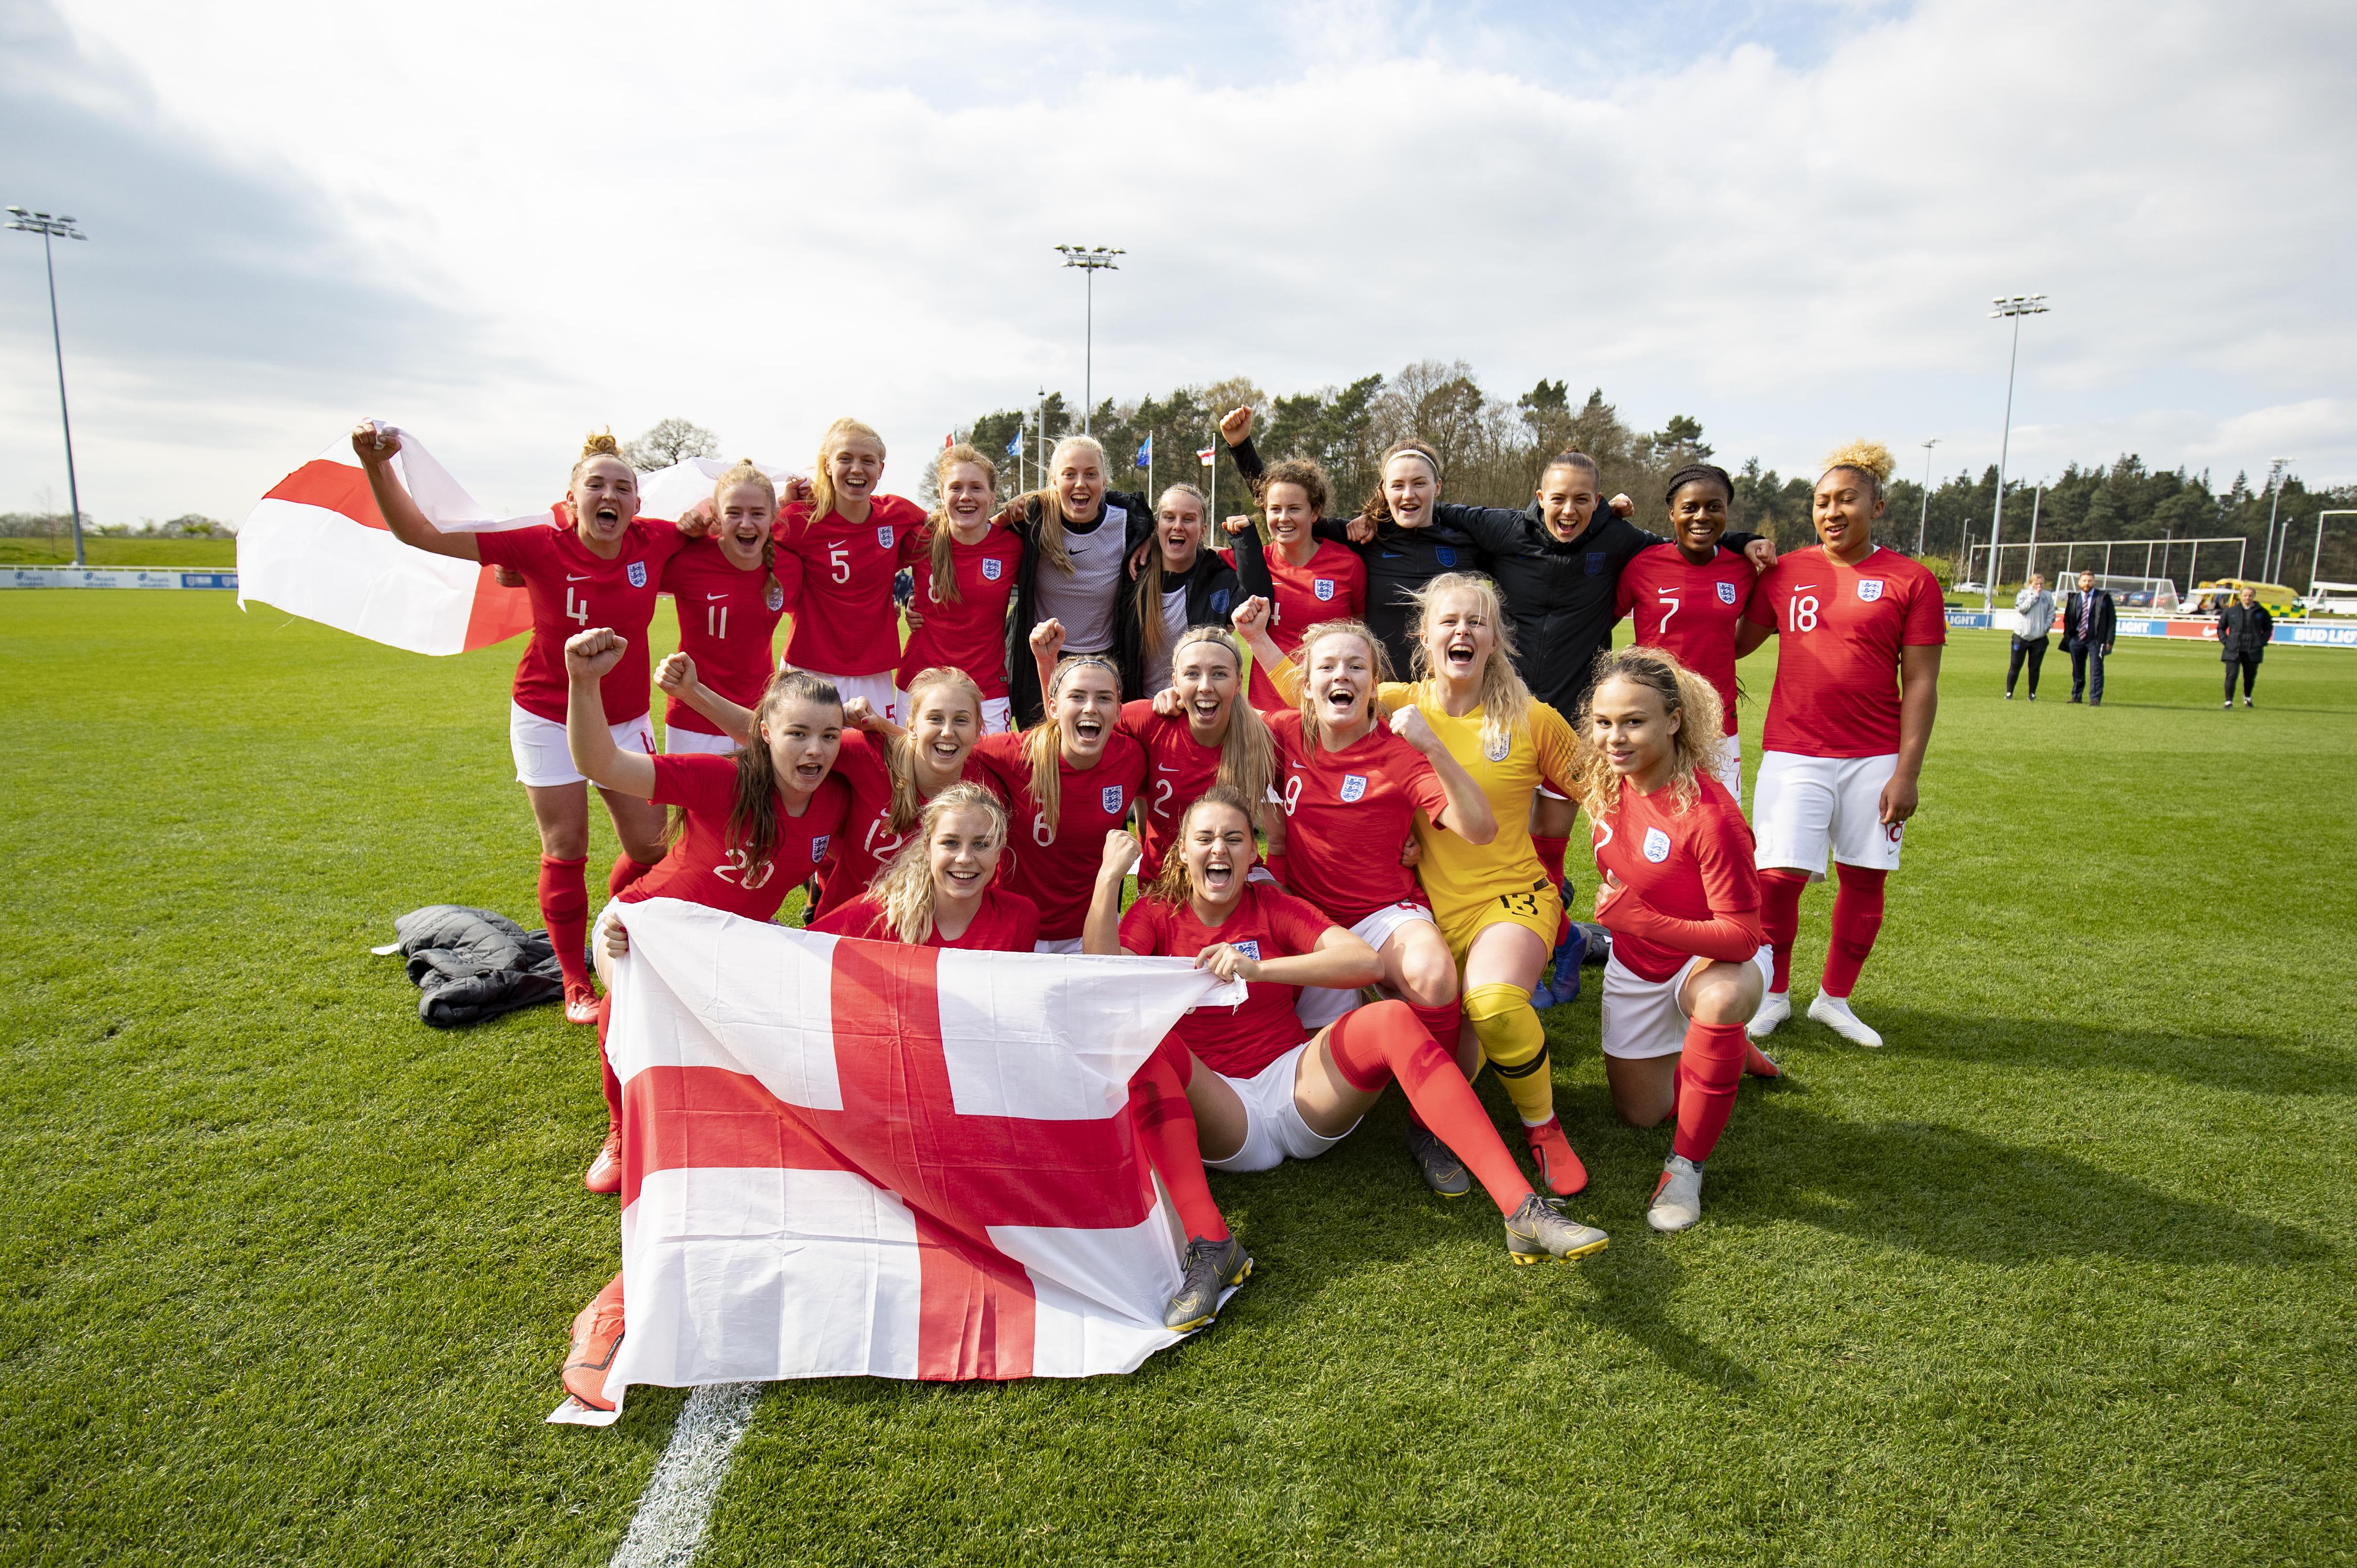 England U19s vs Italy, 2019 U19 Elite Round